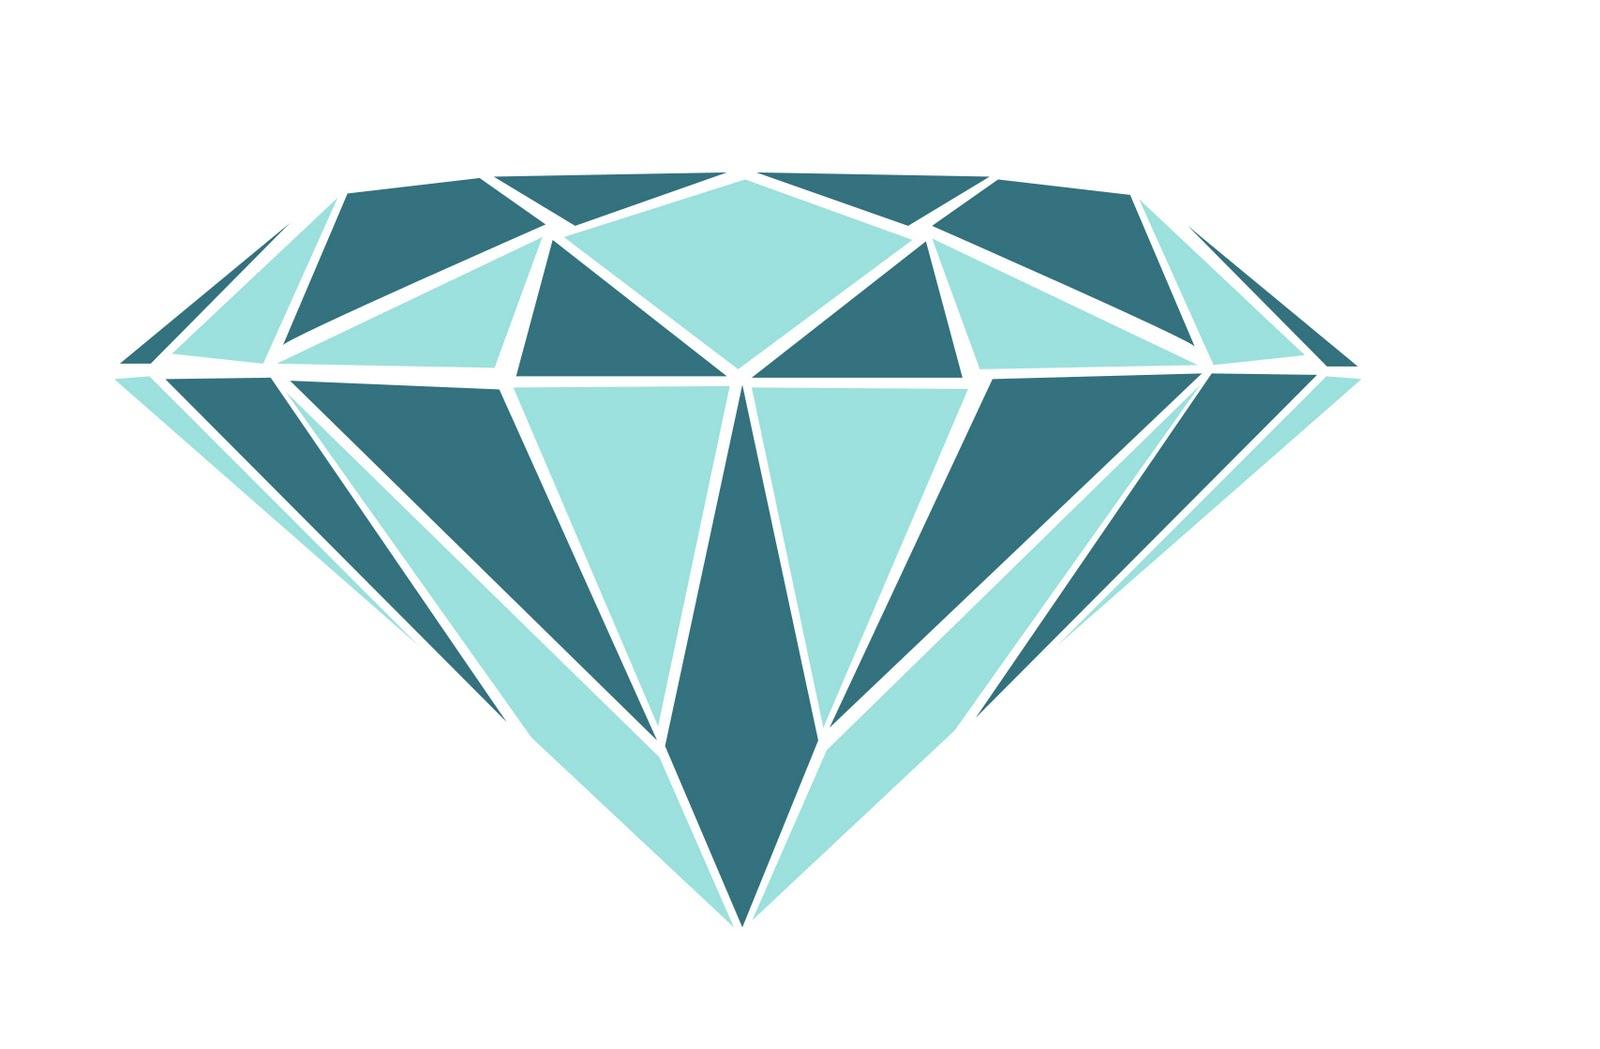 diamond shaped logo png